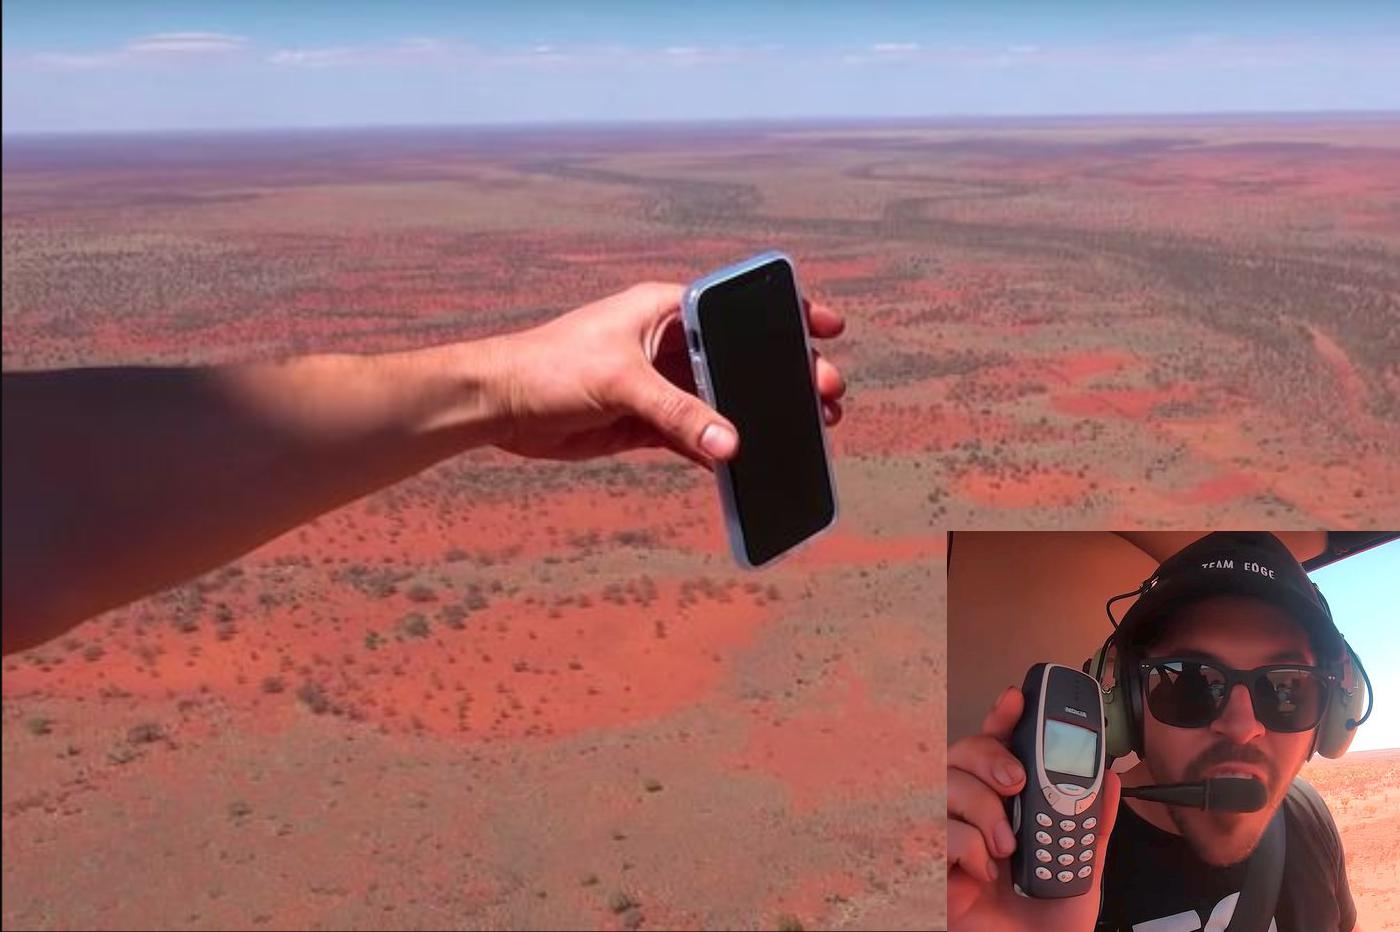 iphone 11 vs nokia 3310